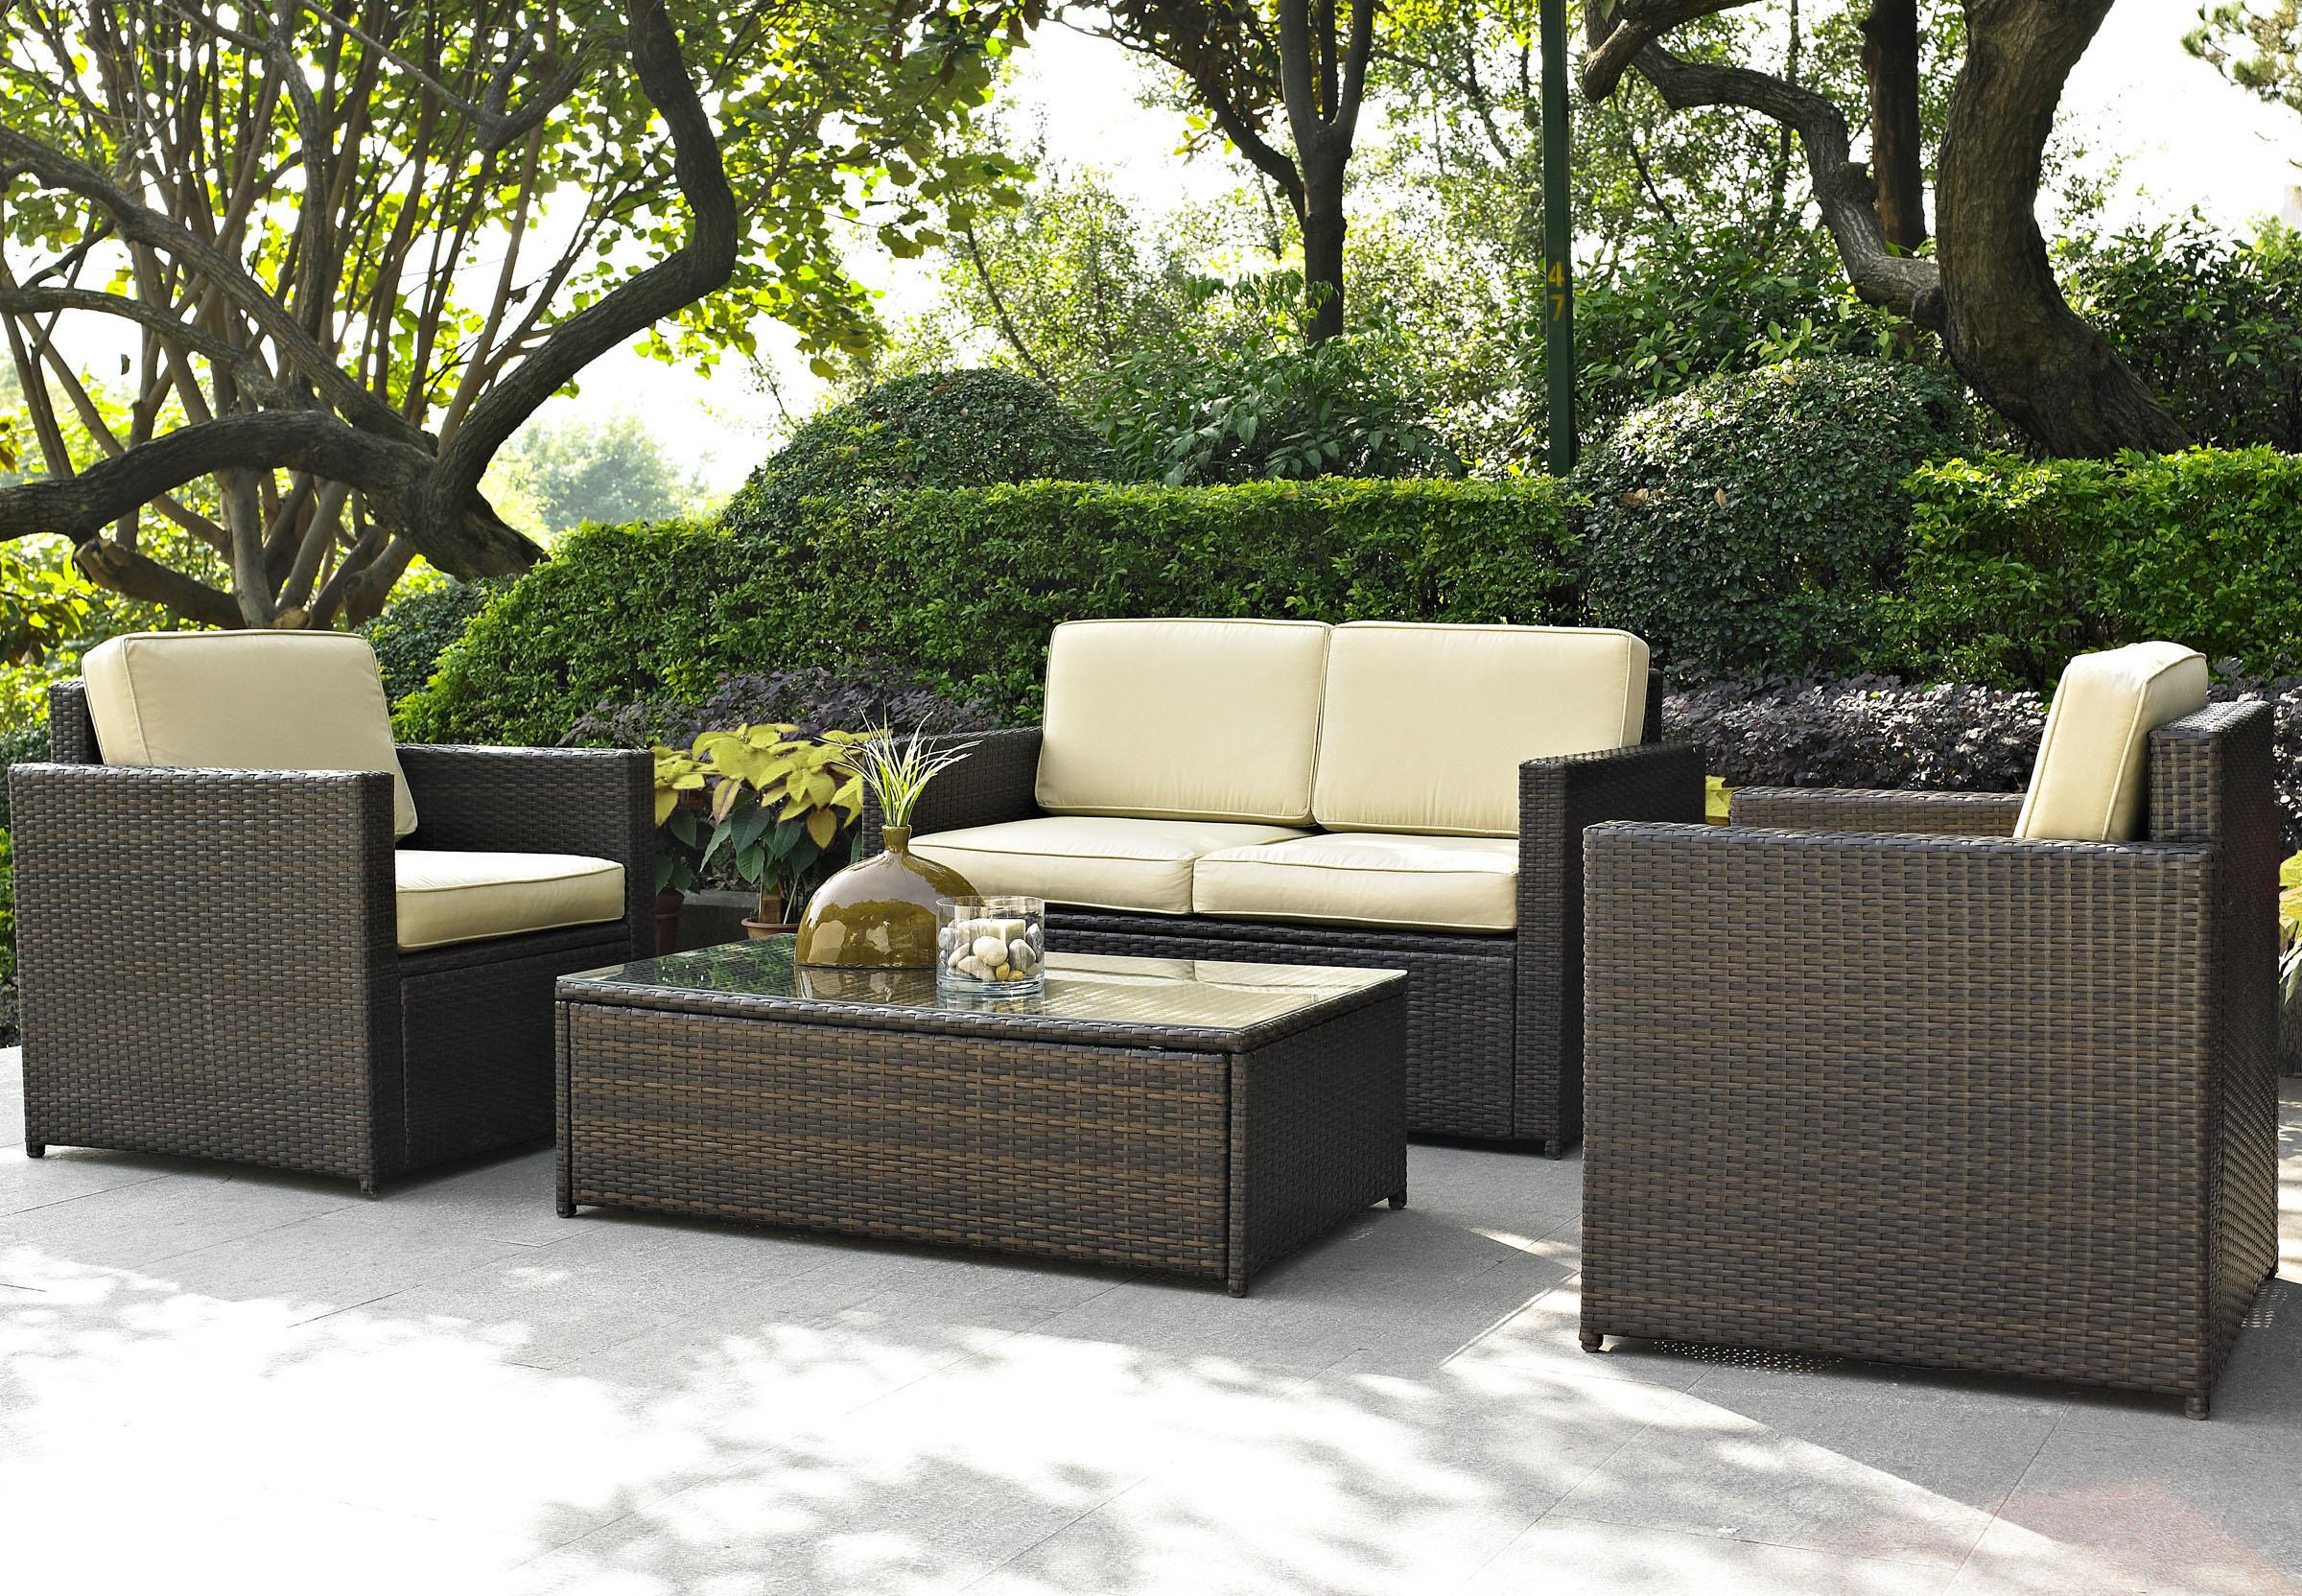 23 modern outdoor furniture ideas designbump Backyard Outdoor Furniture id=50458